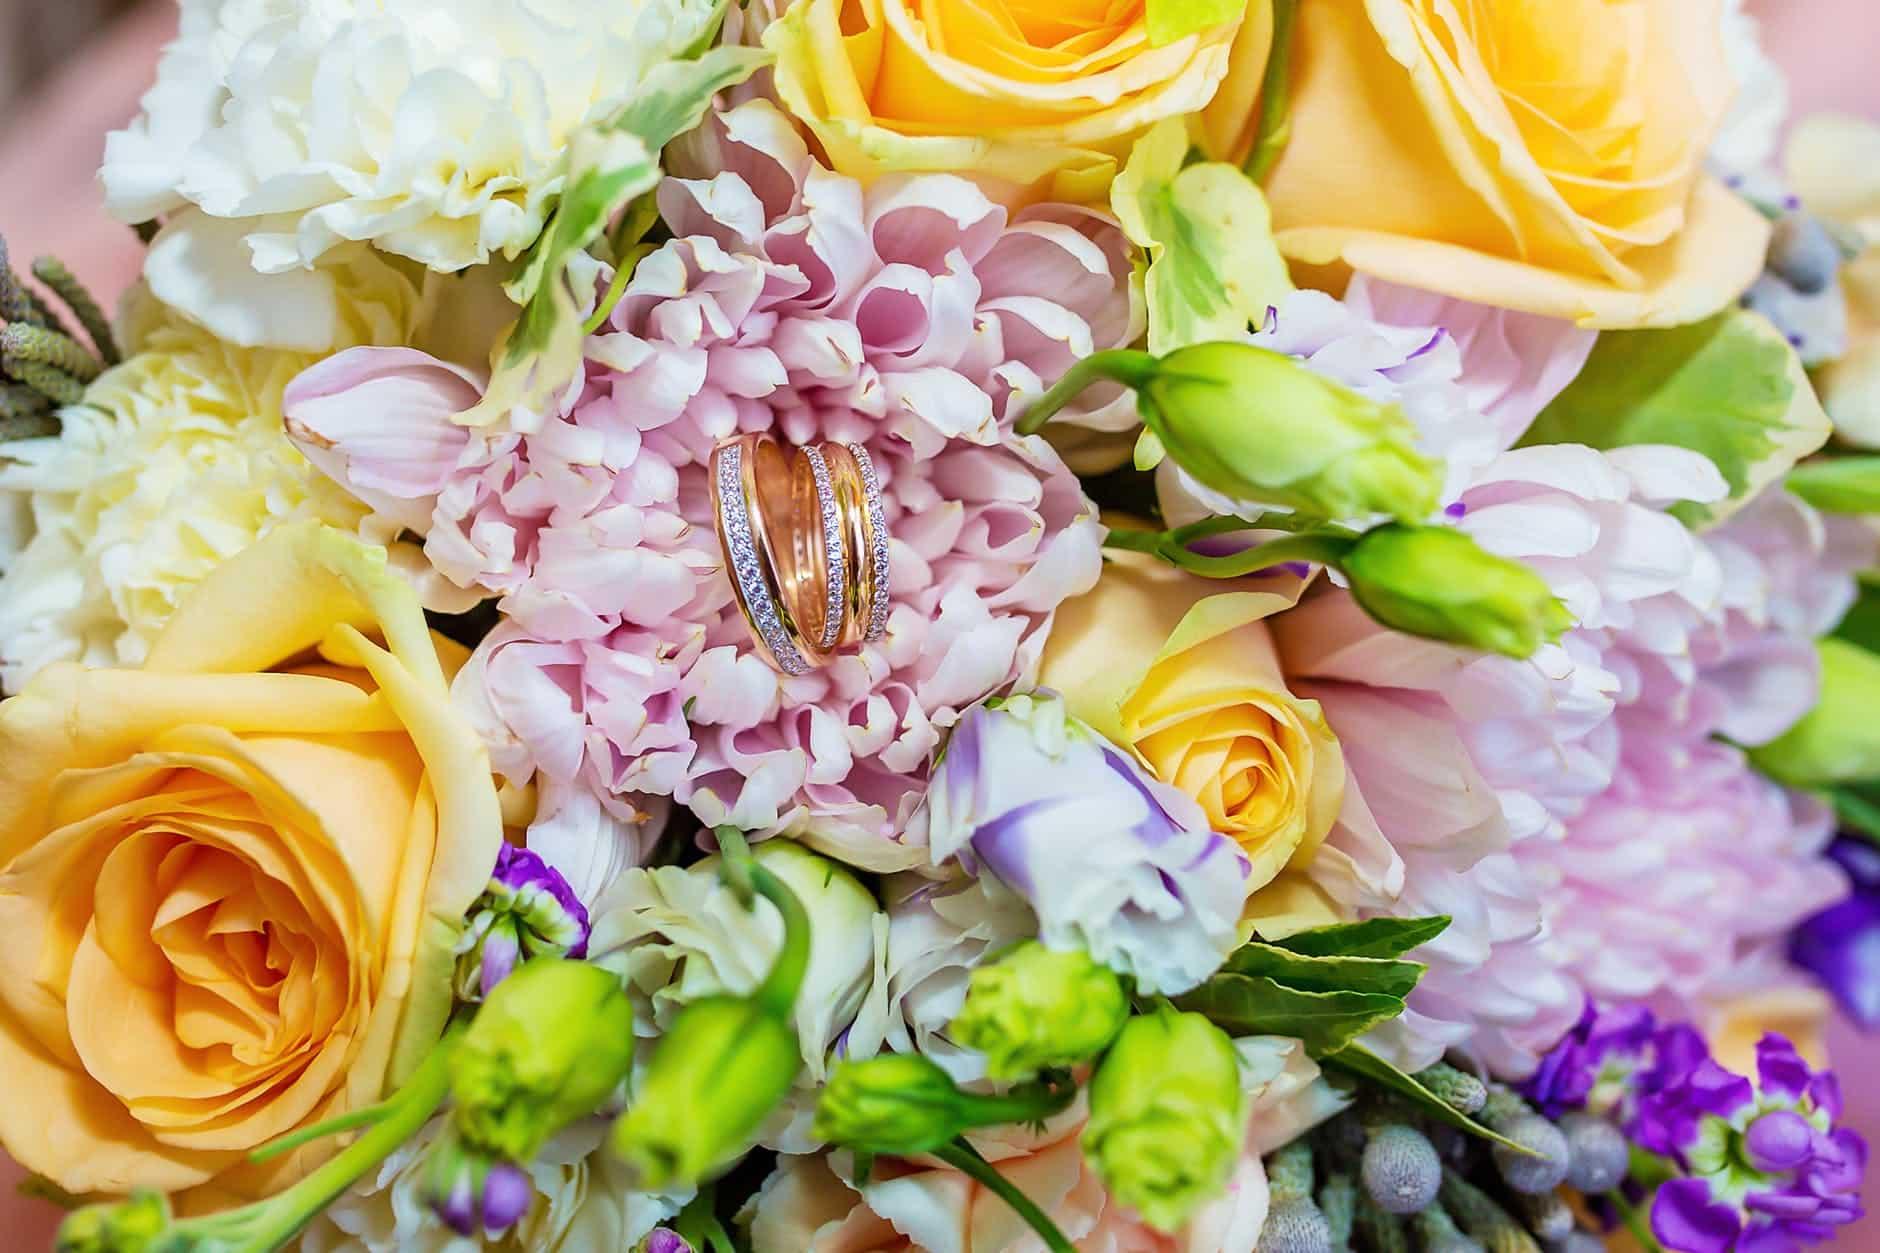 elegant wedding bouquet with golden rings